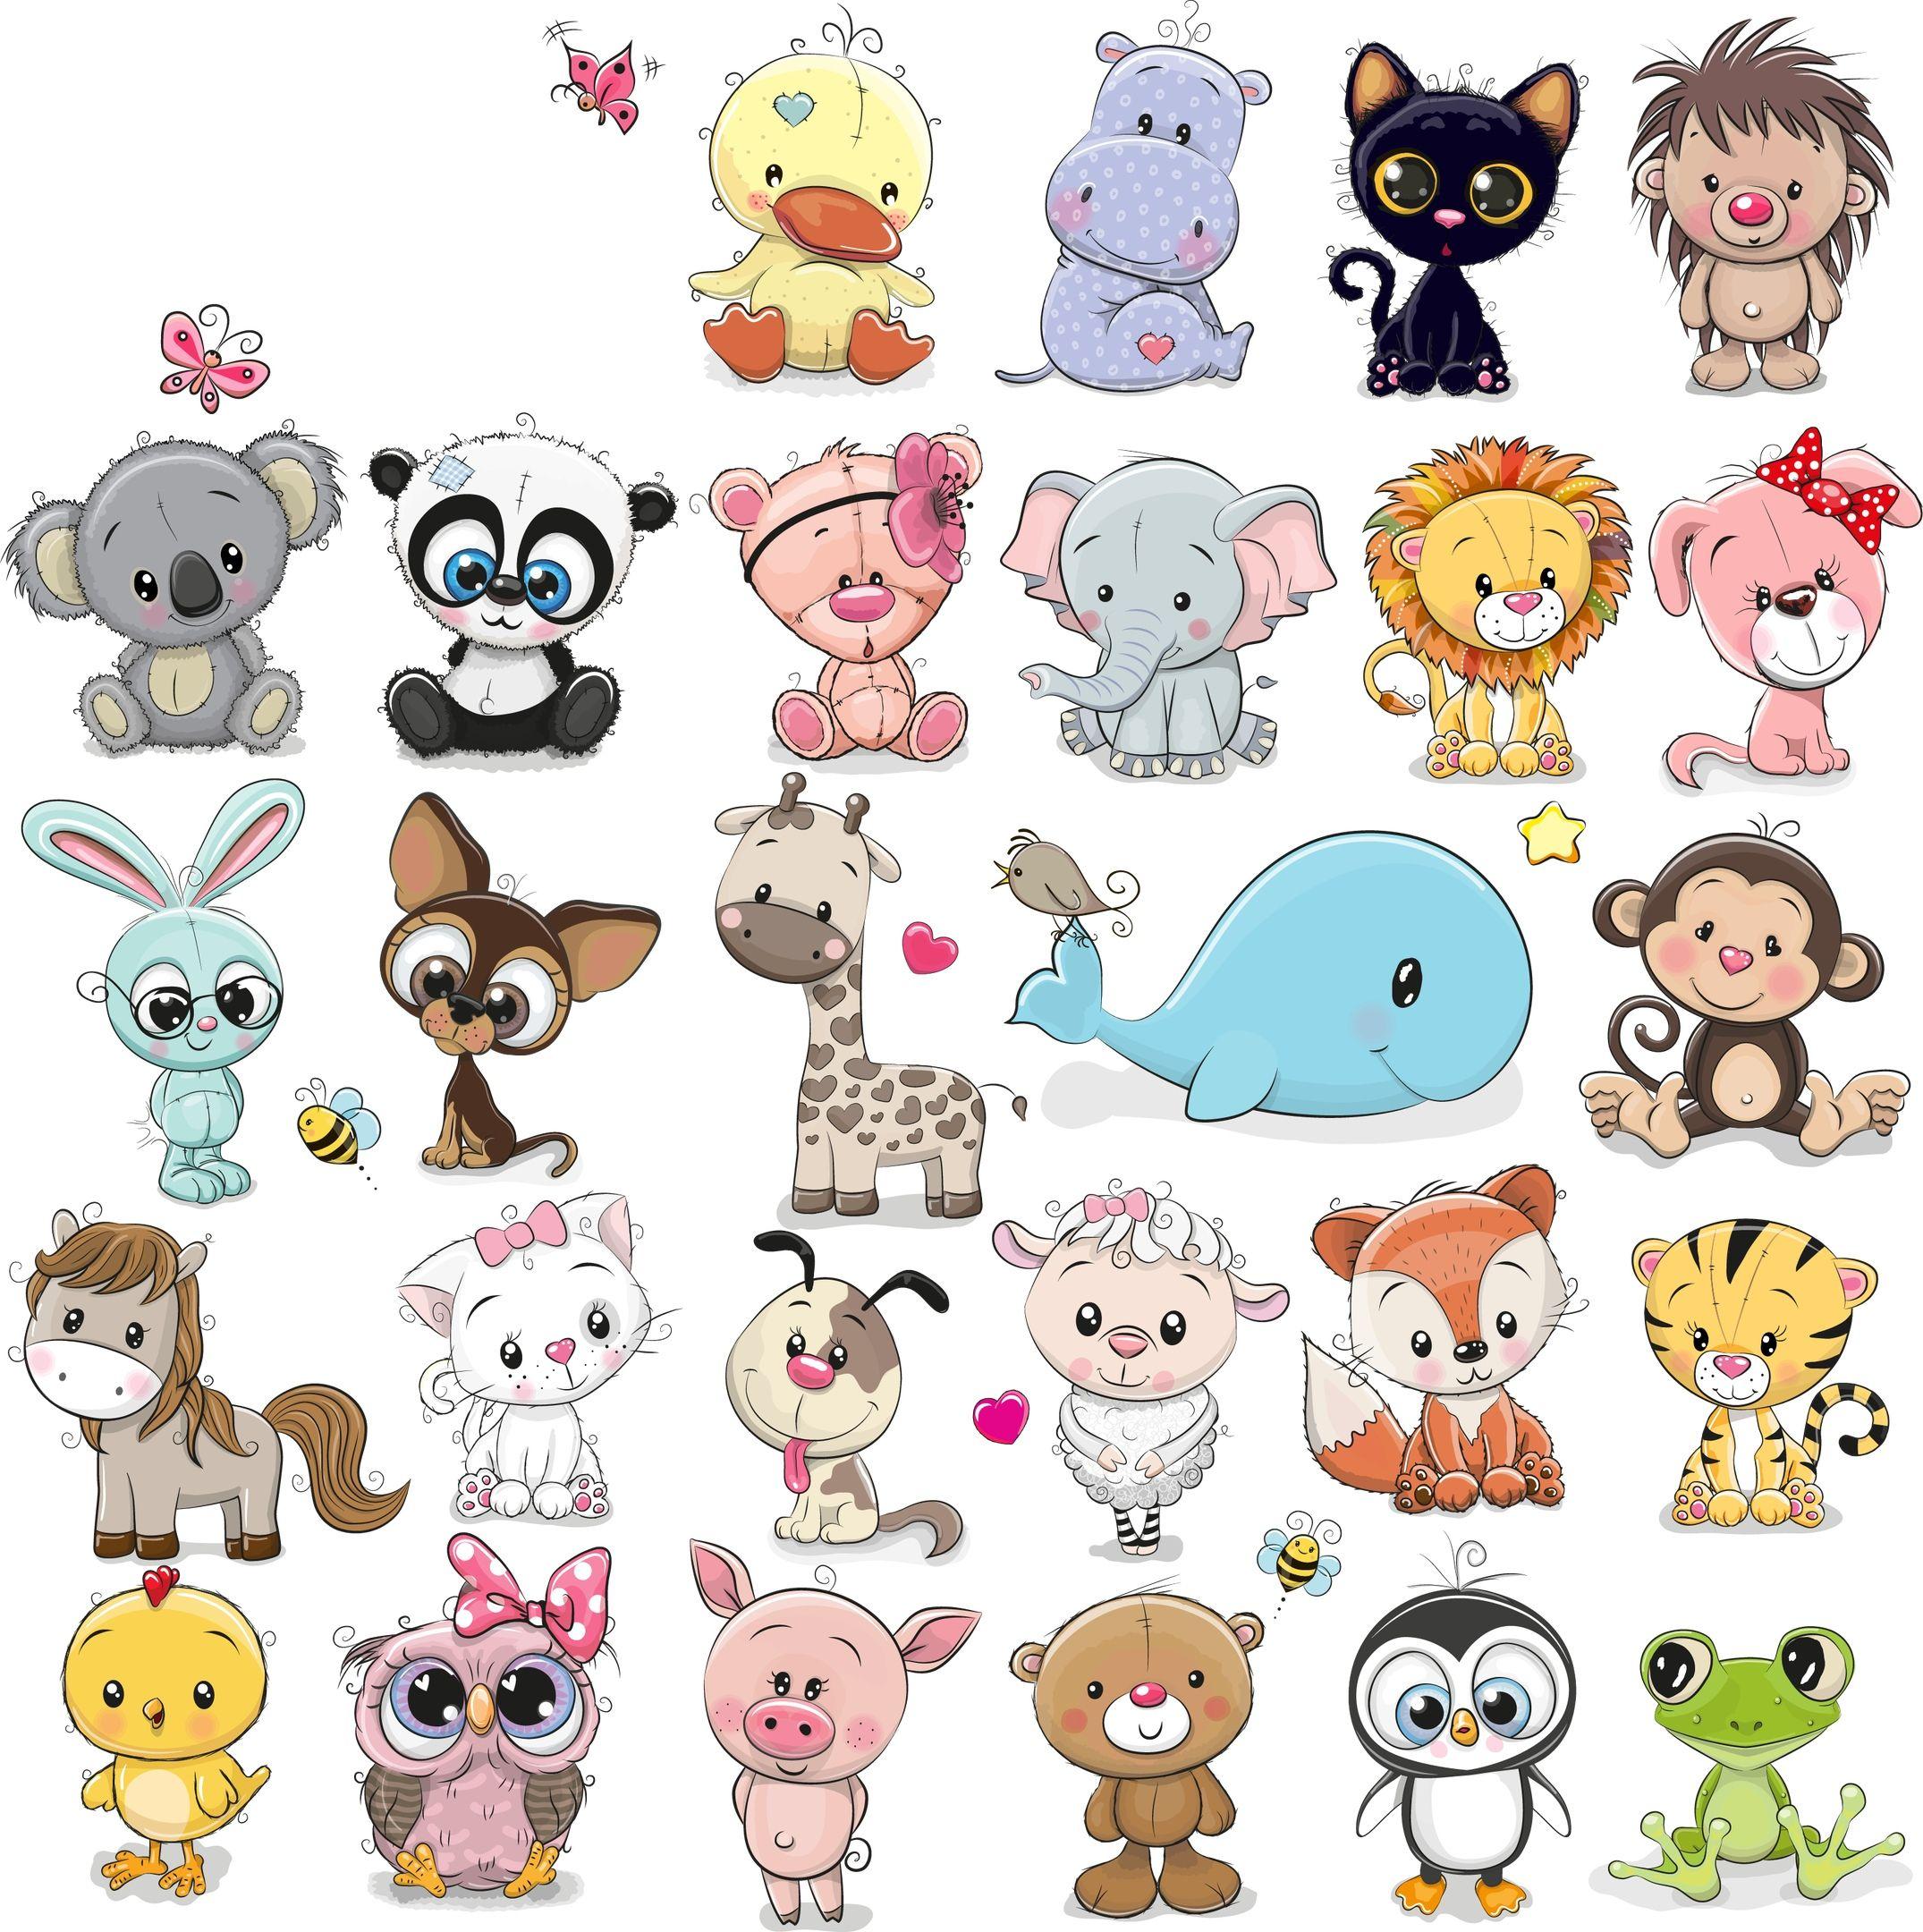 Novosti Dibujos De Animales Tiernos Dibujos De Animales Animales De Dibujos Animados Bonitos